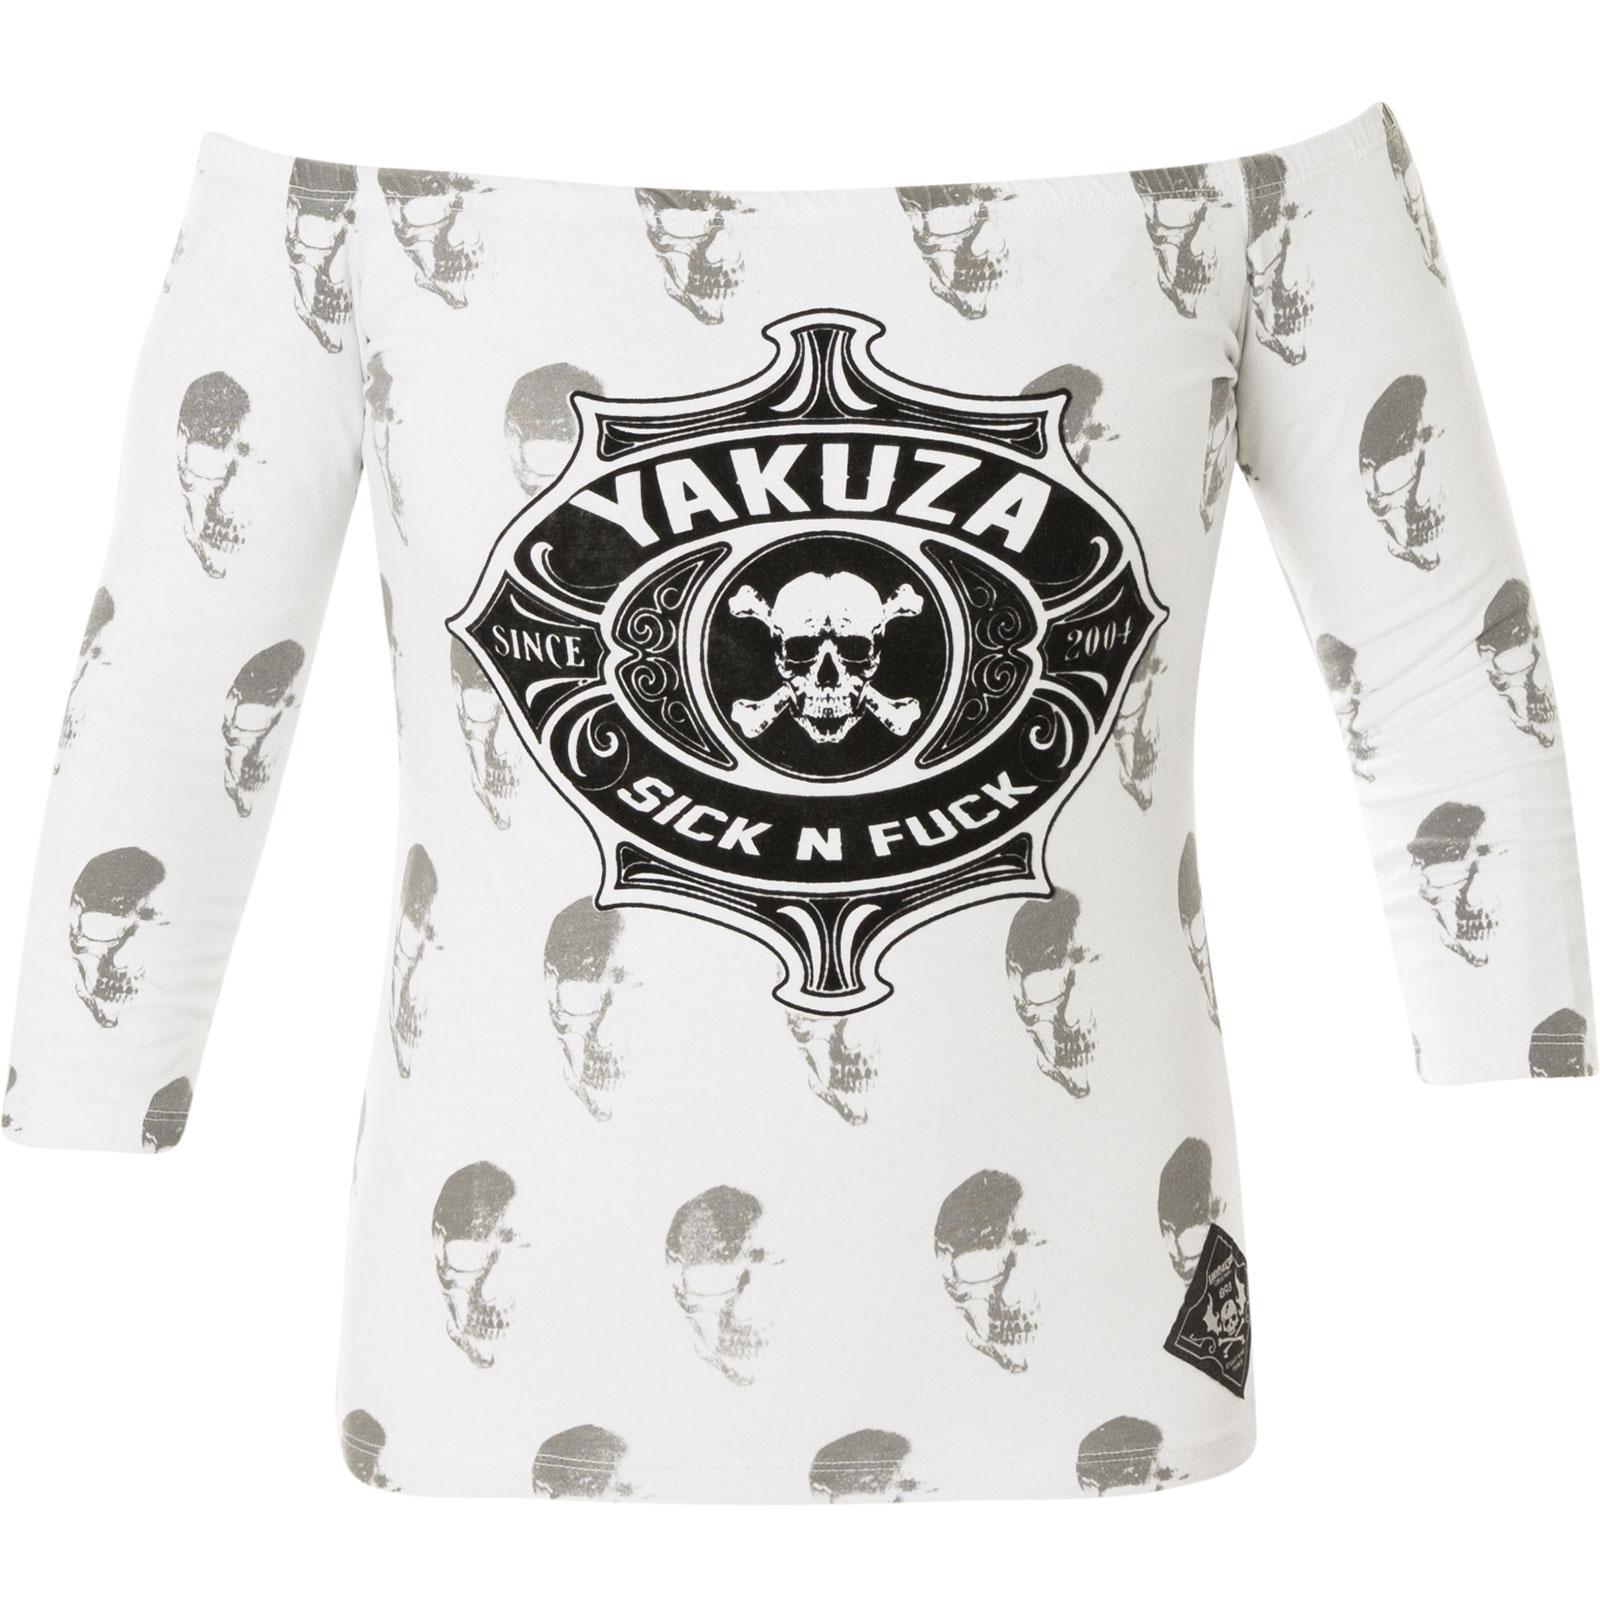 6ad7ac5779d3d7 ... Yakuza Damen Pullover Sick N Fuck Off Shoulder Longsleeve GLSB-11136  White Weiß ...